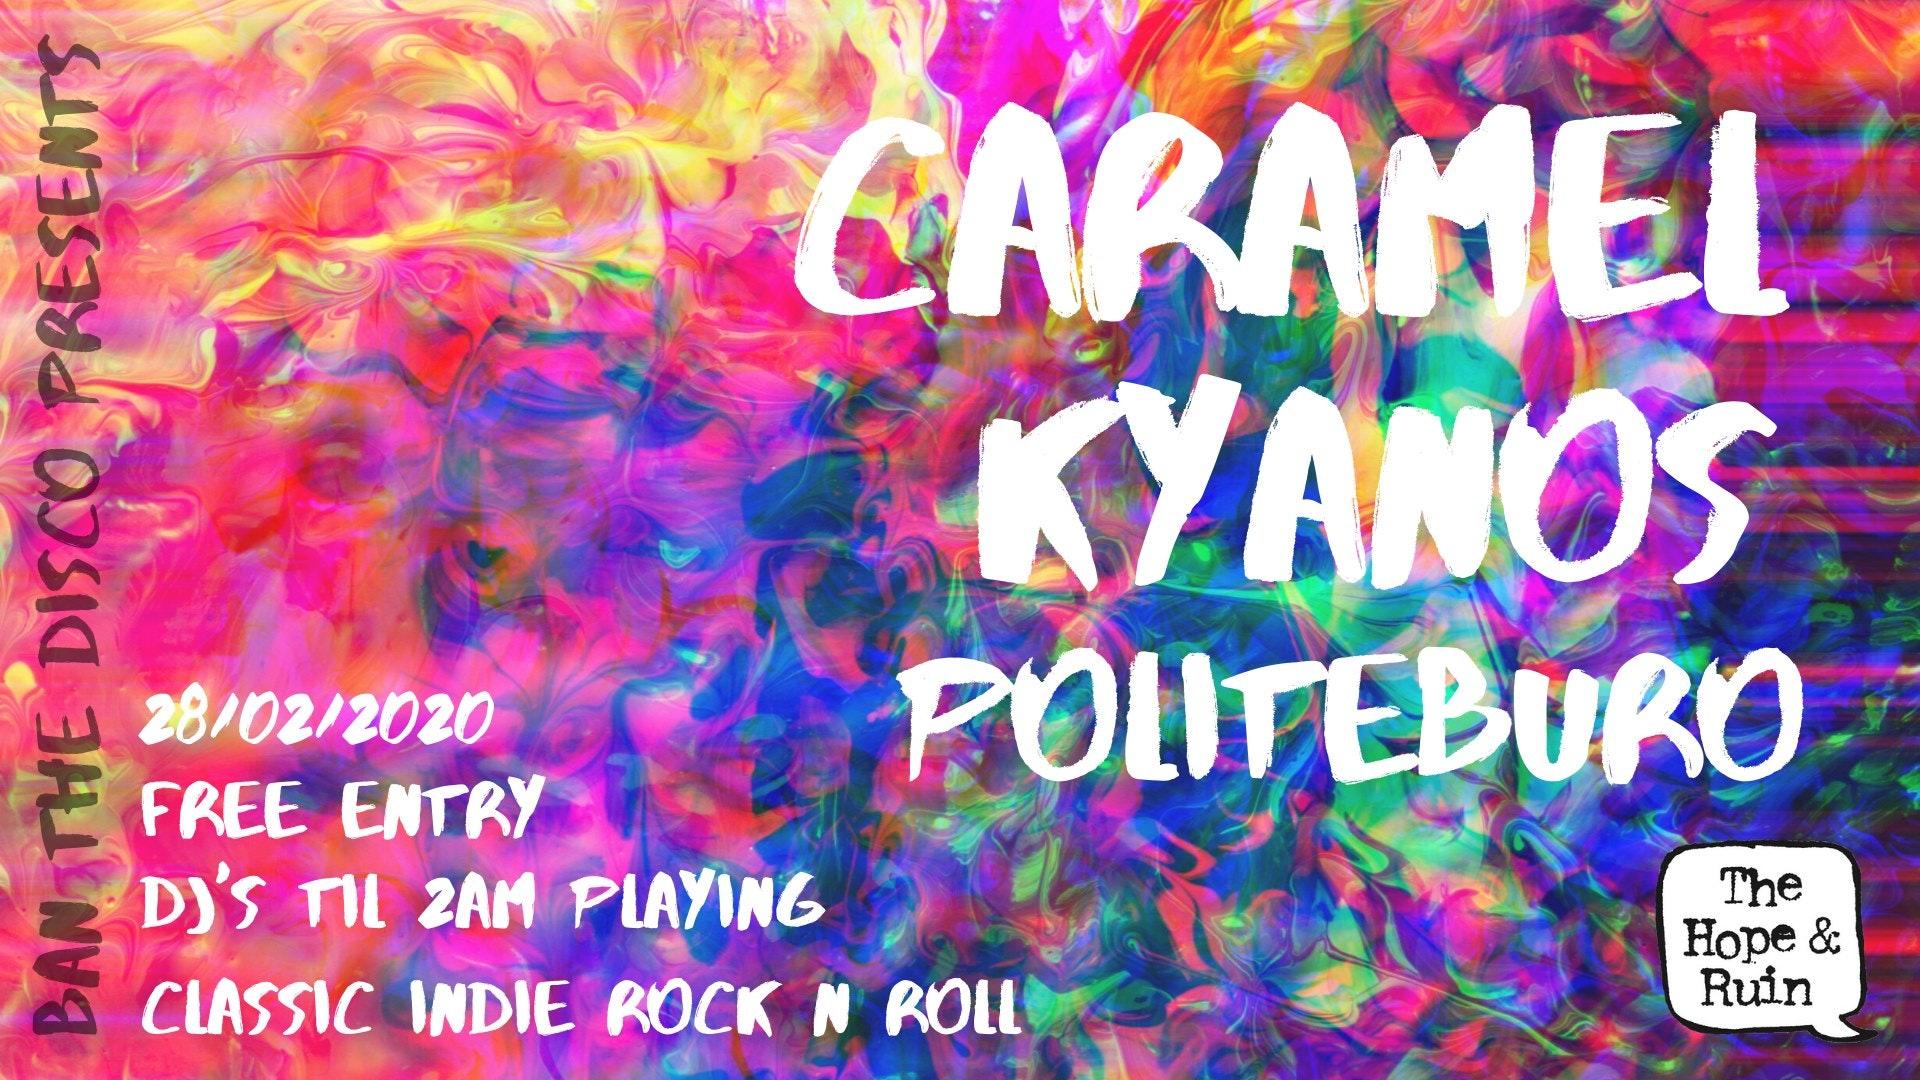 BTD: Caramel + Kyanos + Politeburo